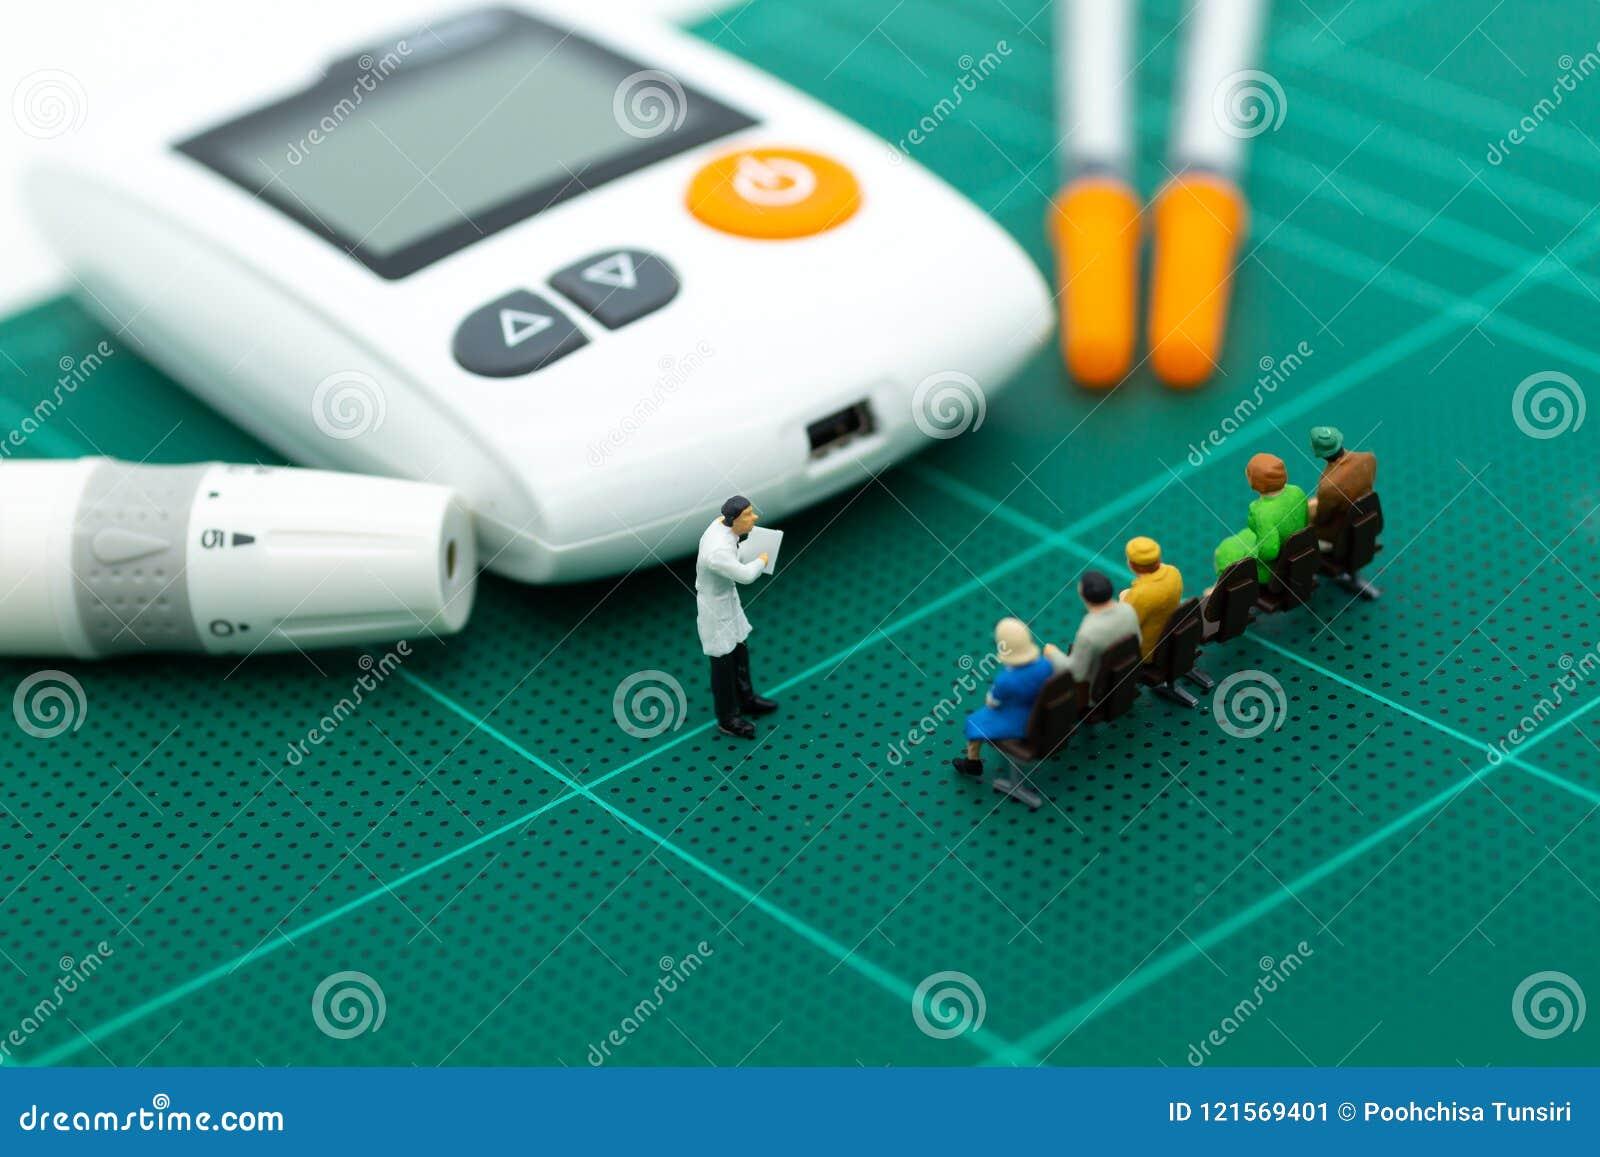 The use of glucose in medicine 74